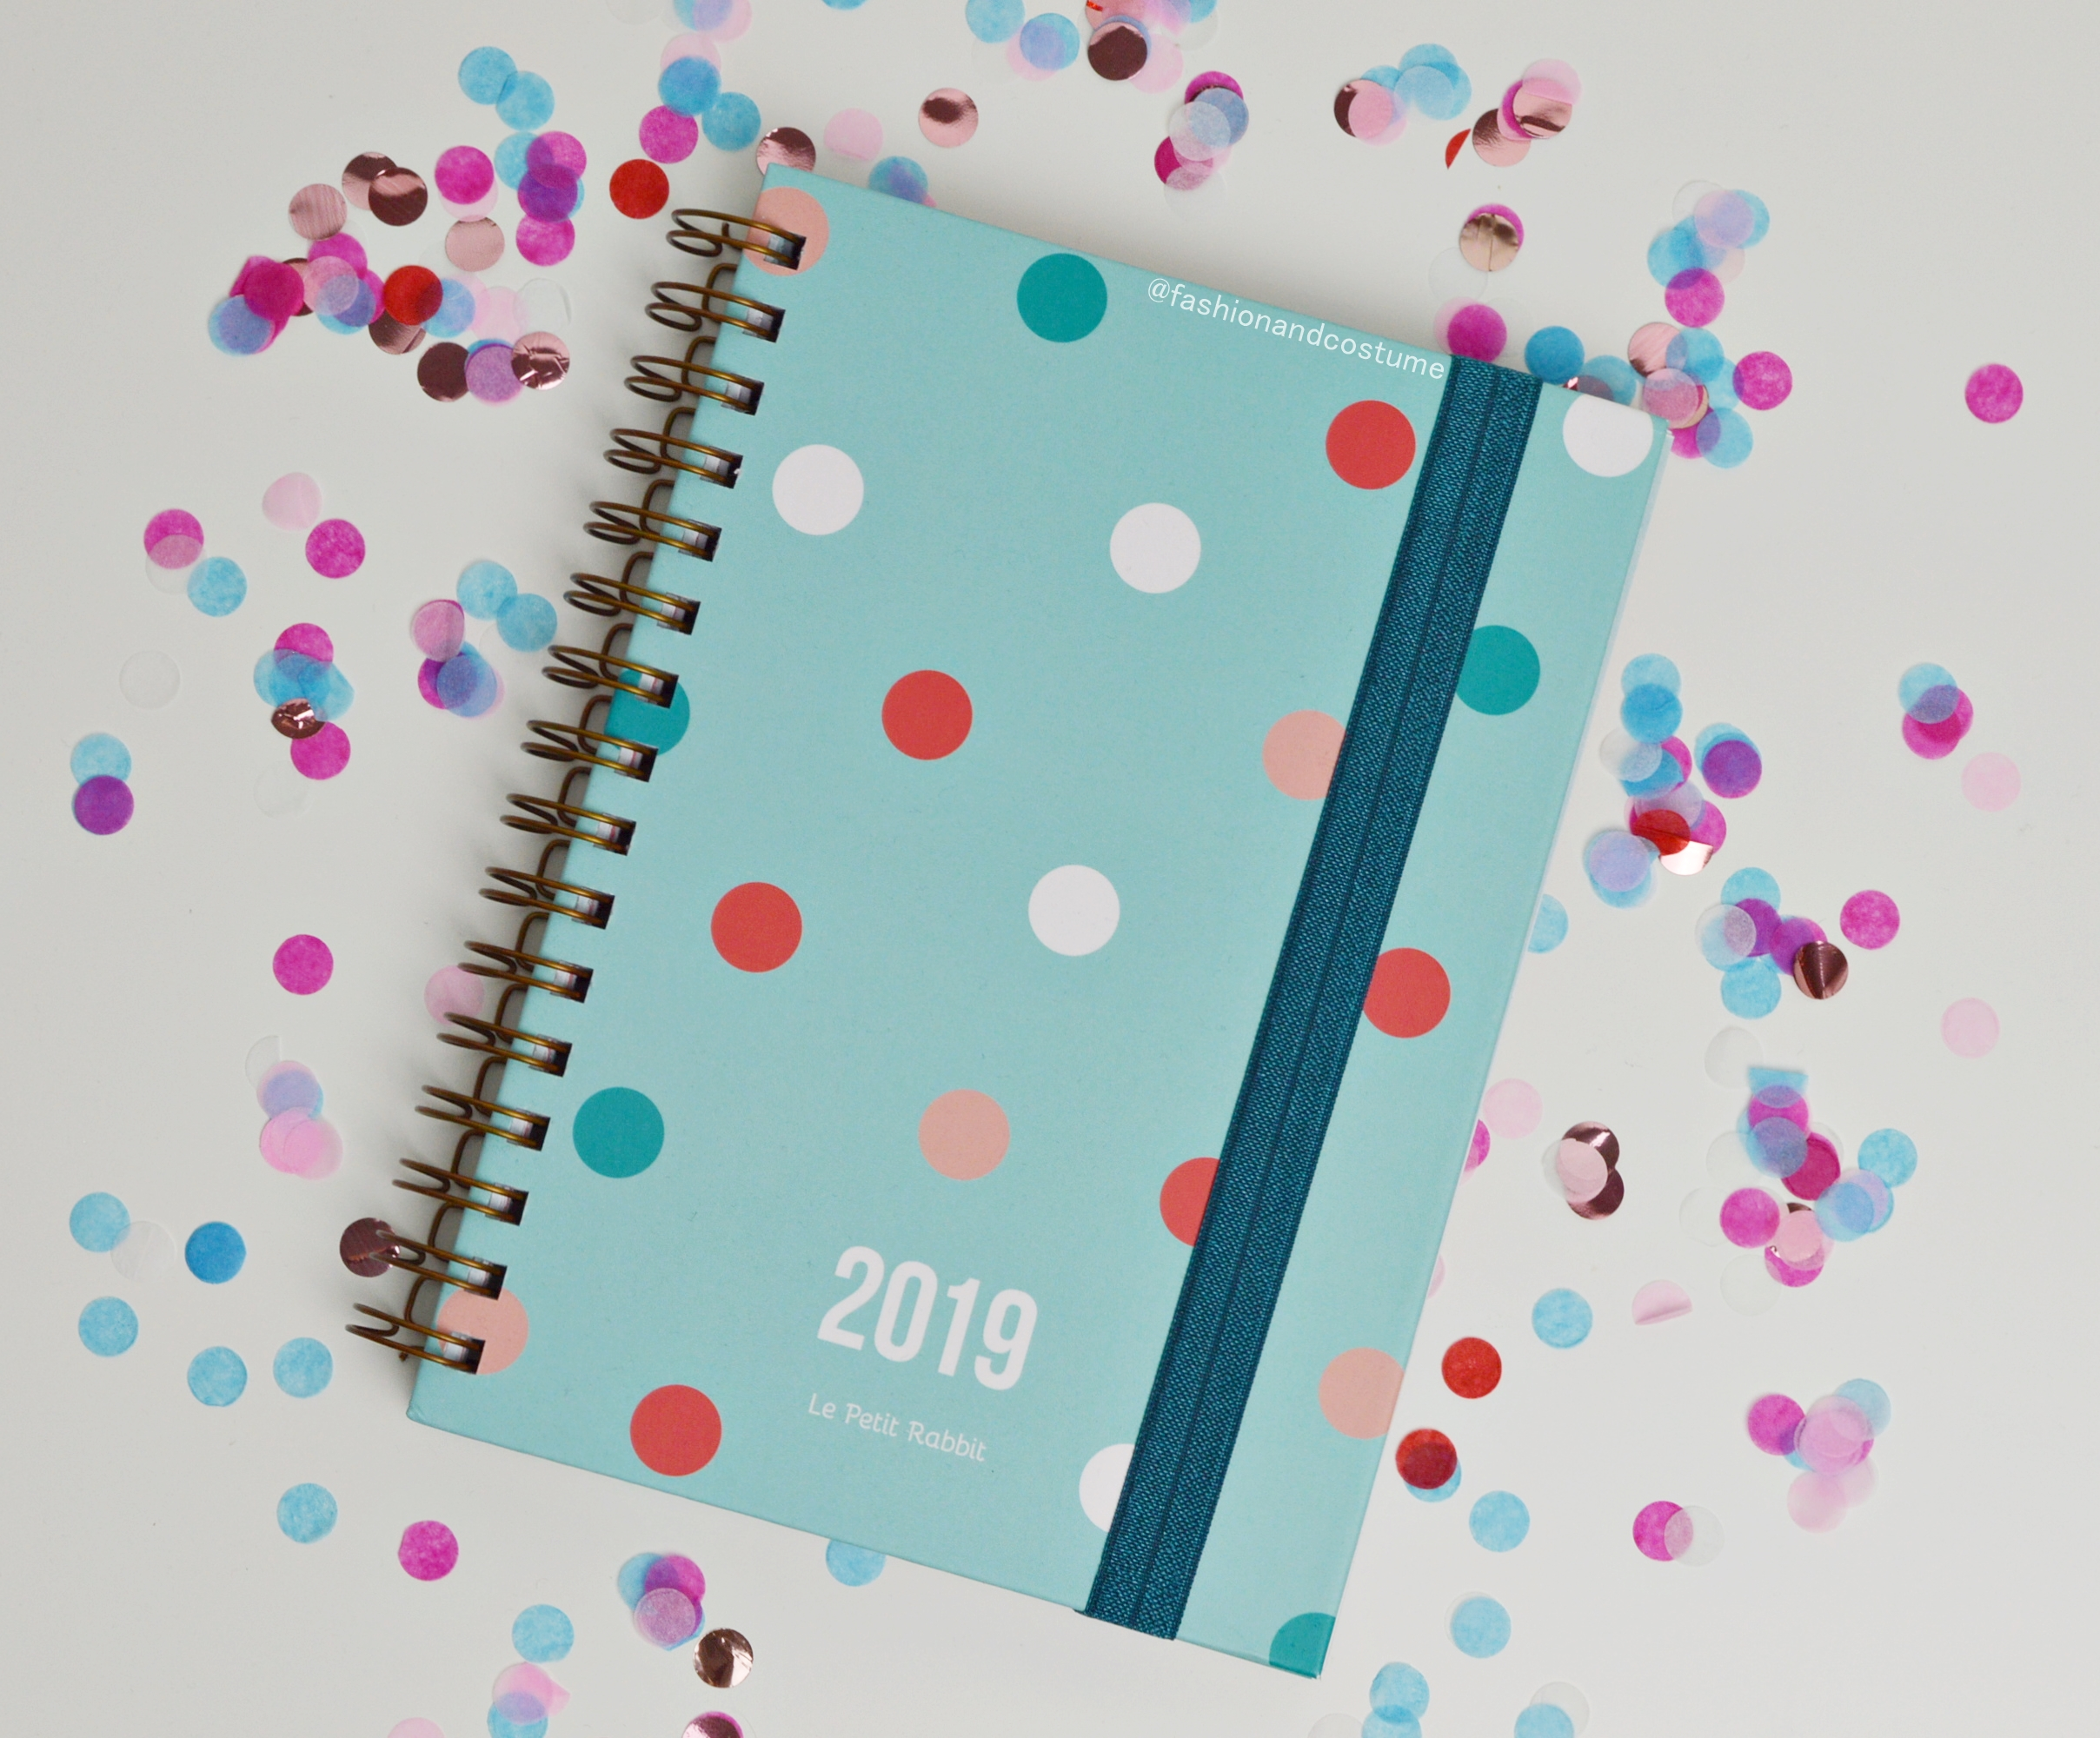 agenda-planner-2019-settimanale-weekly-giulia-lepetitrabbit-le-petit-rabbit-fashion-and-costume-fashionandcostume-graphic-designer-sticker